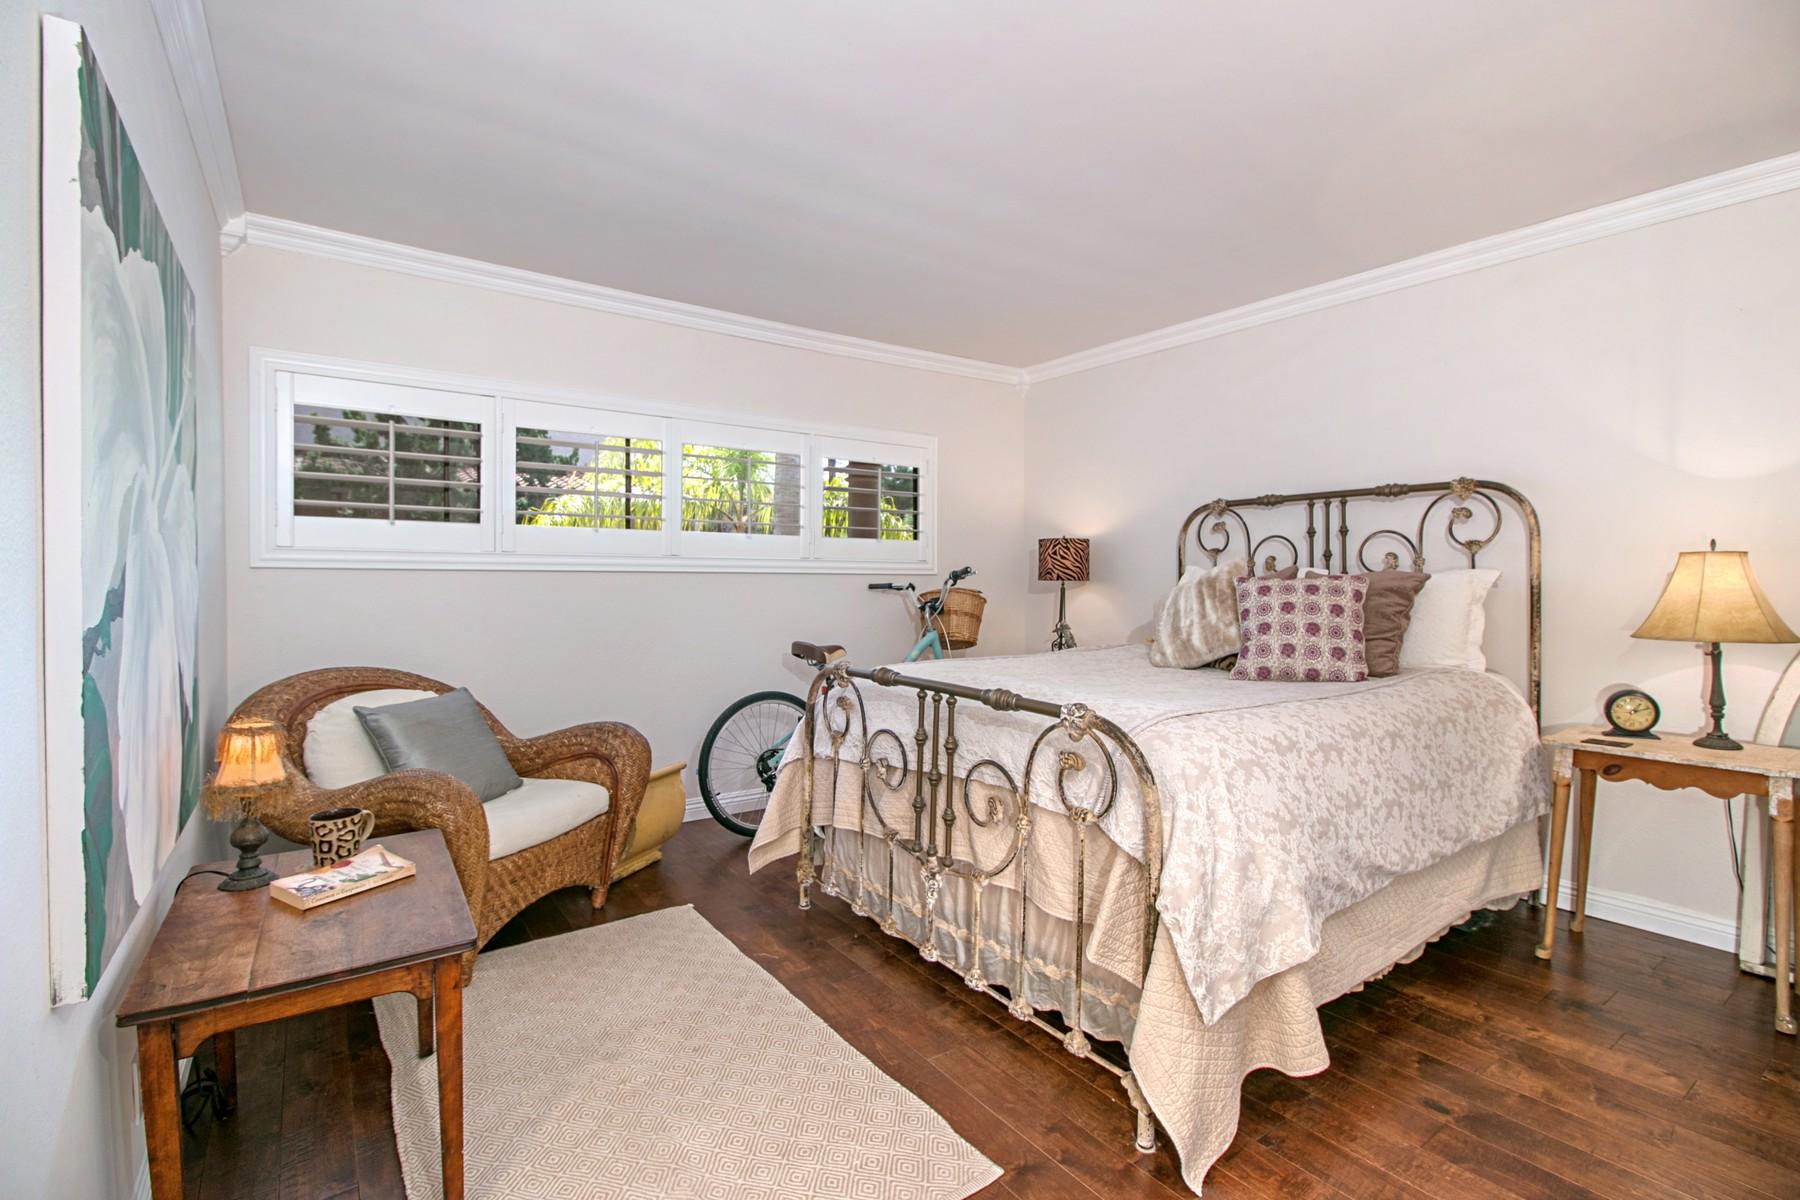 Additional photo for property listing at 2564 Navarra Drive 2564 Navarra Drive 108 Carlsbad, Californie 92009 États-Unis